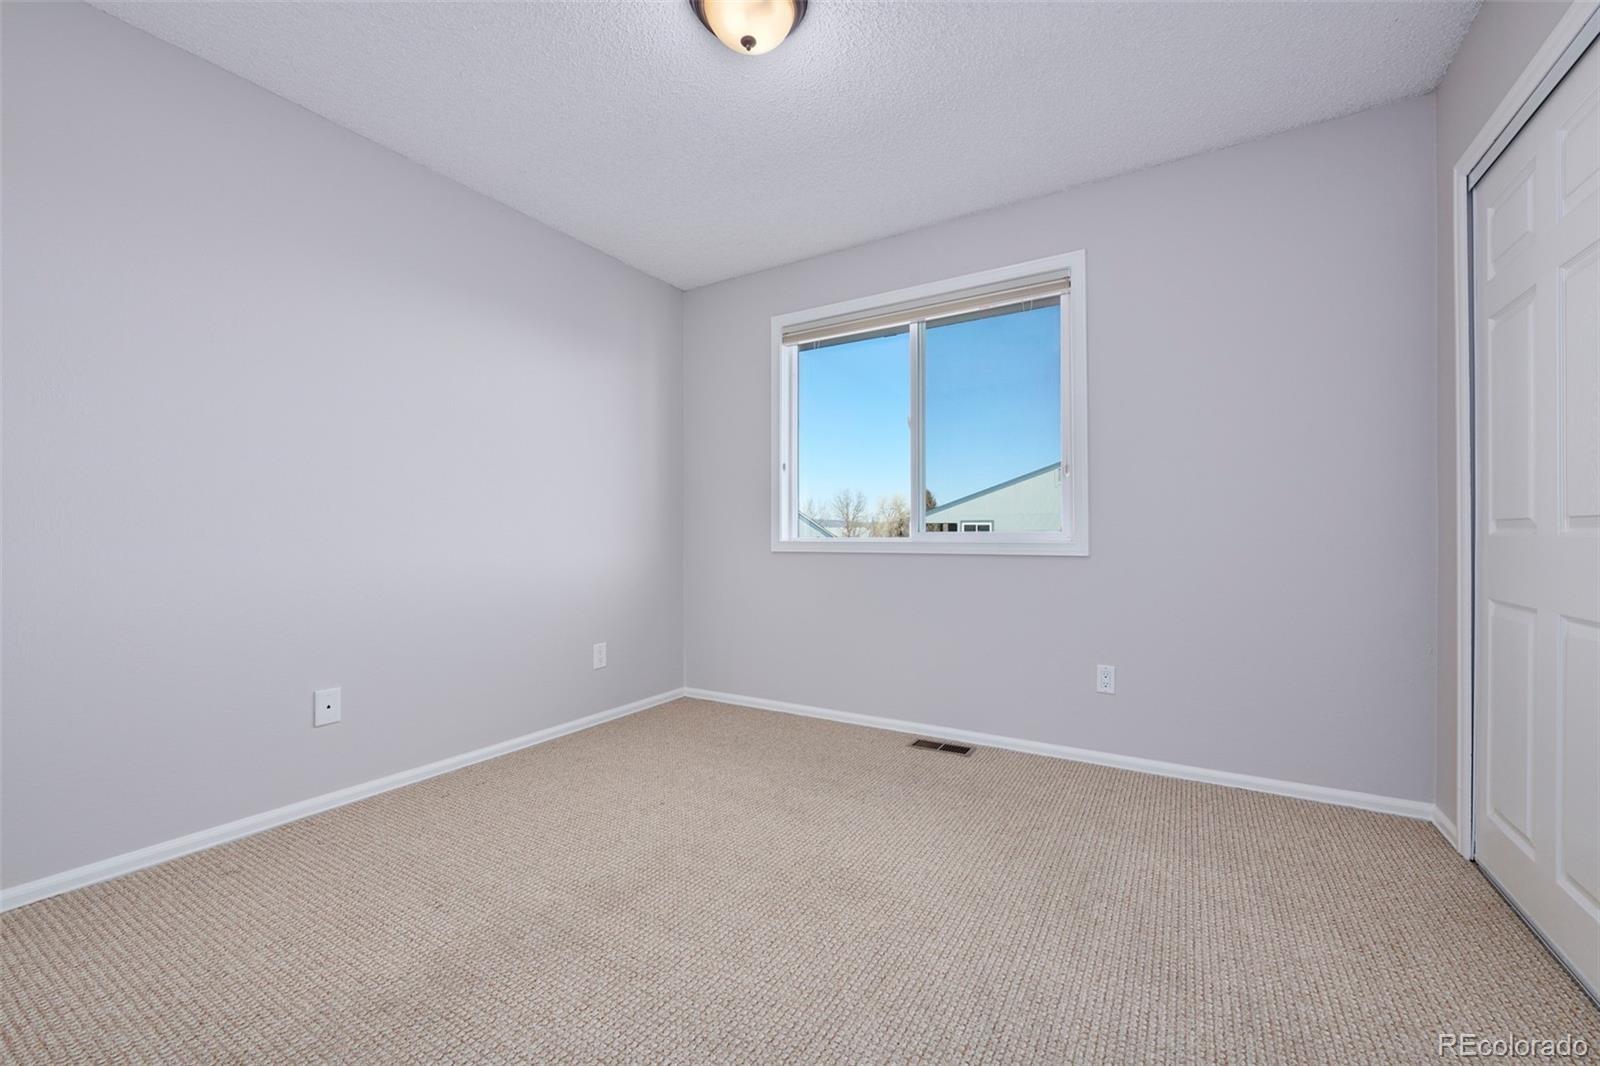 MLS# 4164486 - 17 - 4207 Monroe Drive #D, Boulder, CO 80303